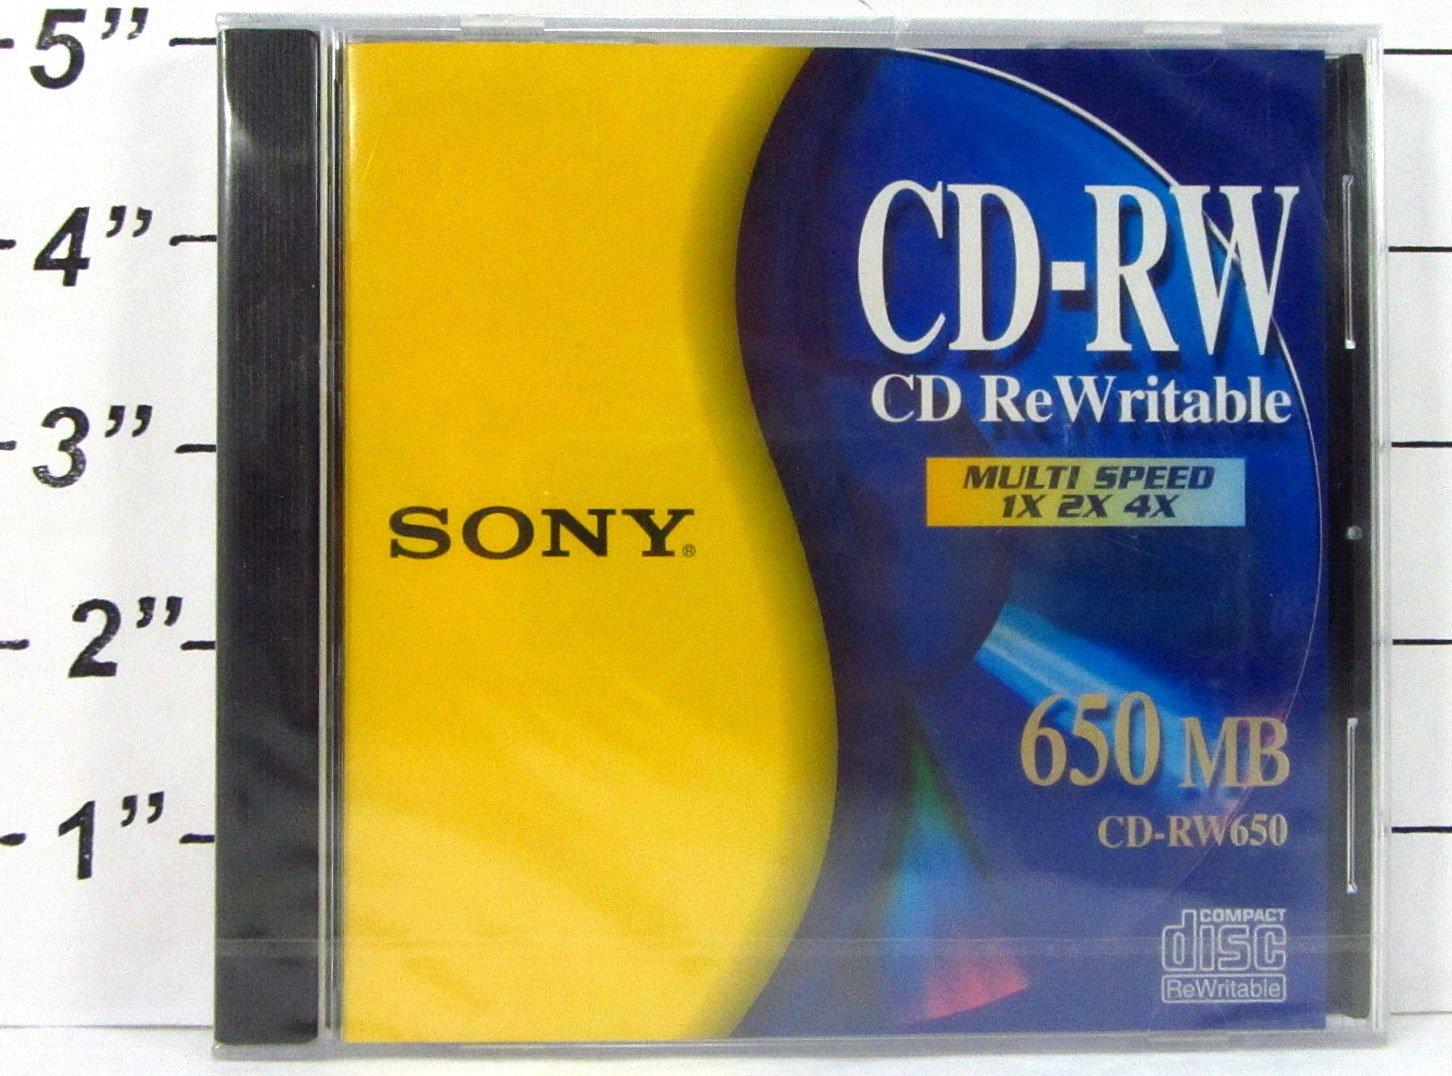 Sony CD-RW CD ReWritable Multi Speed 1X 2X 4X 650 MB Sony Corporation 5269235